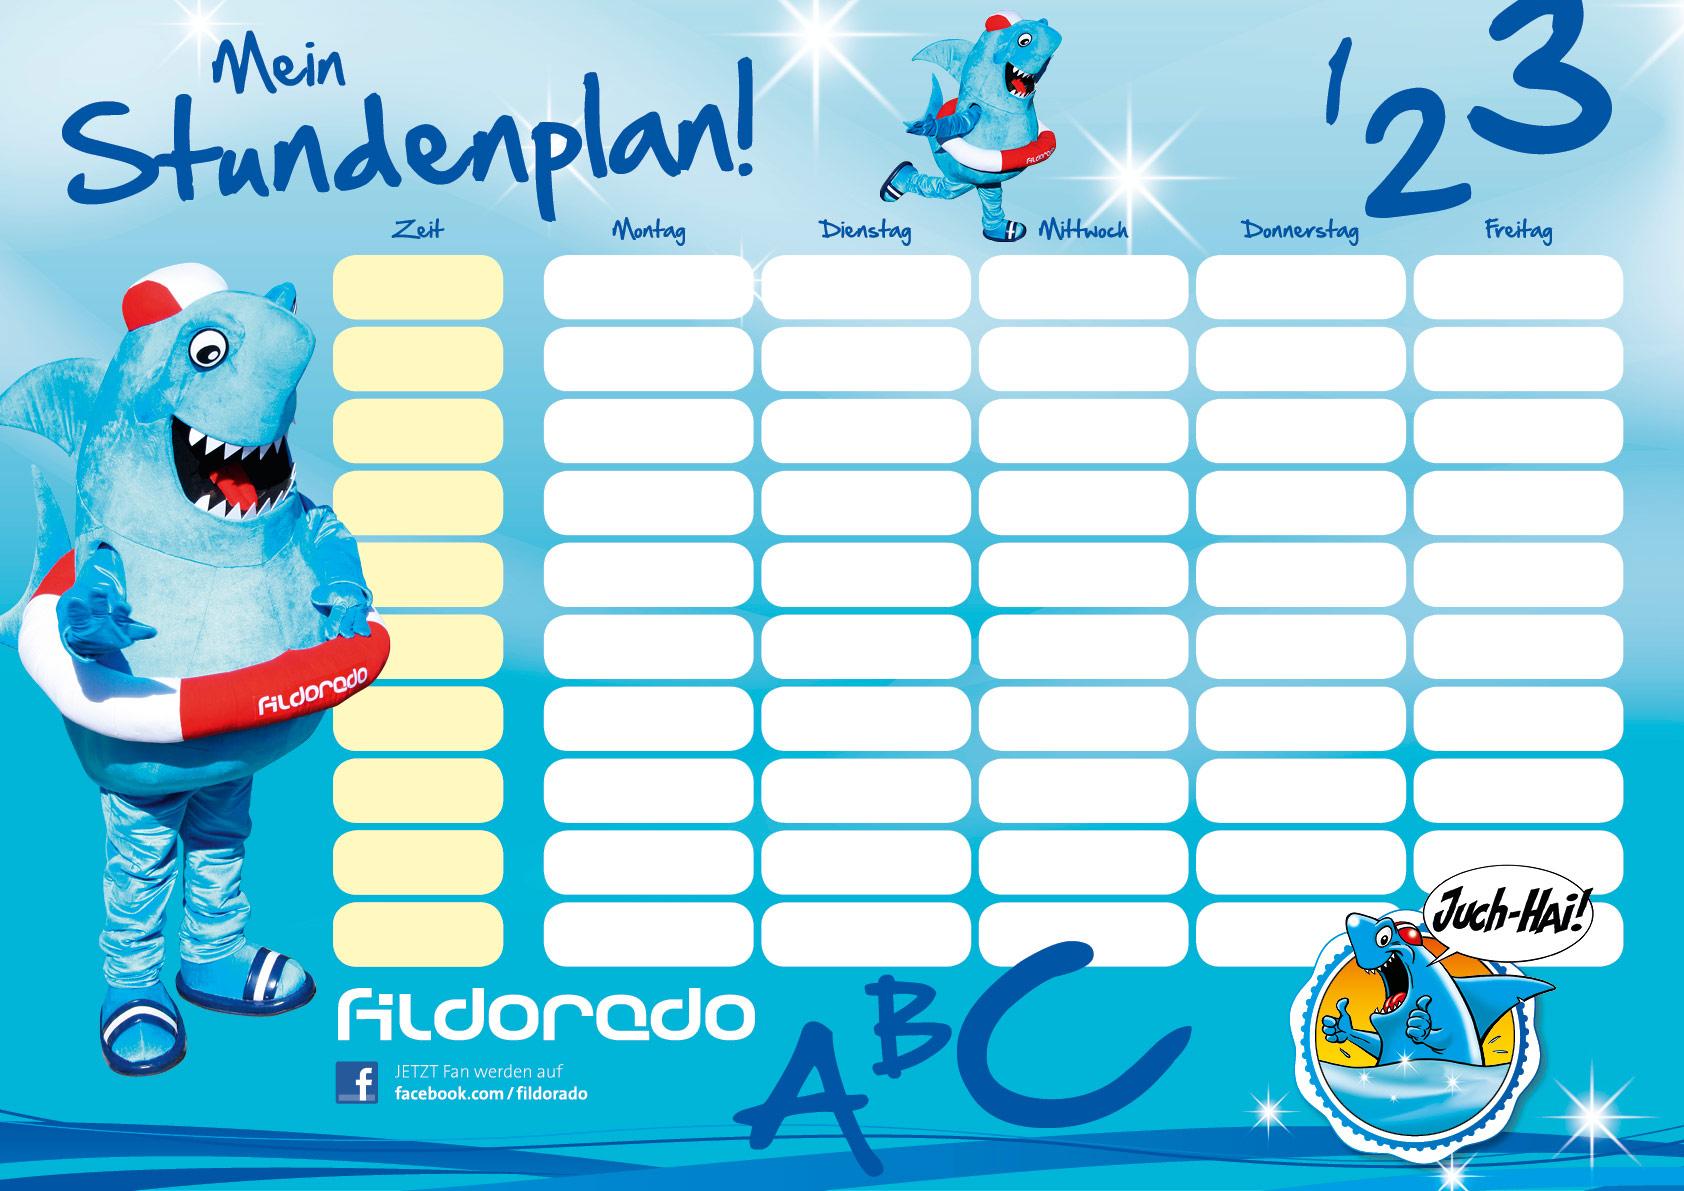 Service - FILDORADO - Erlebnisbad, Kinderwelt, Wellness & Spa, Fitness